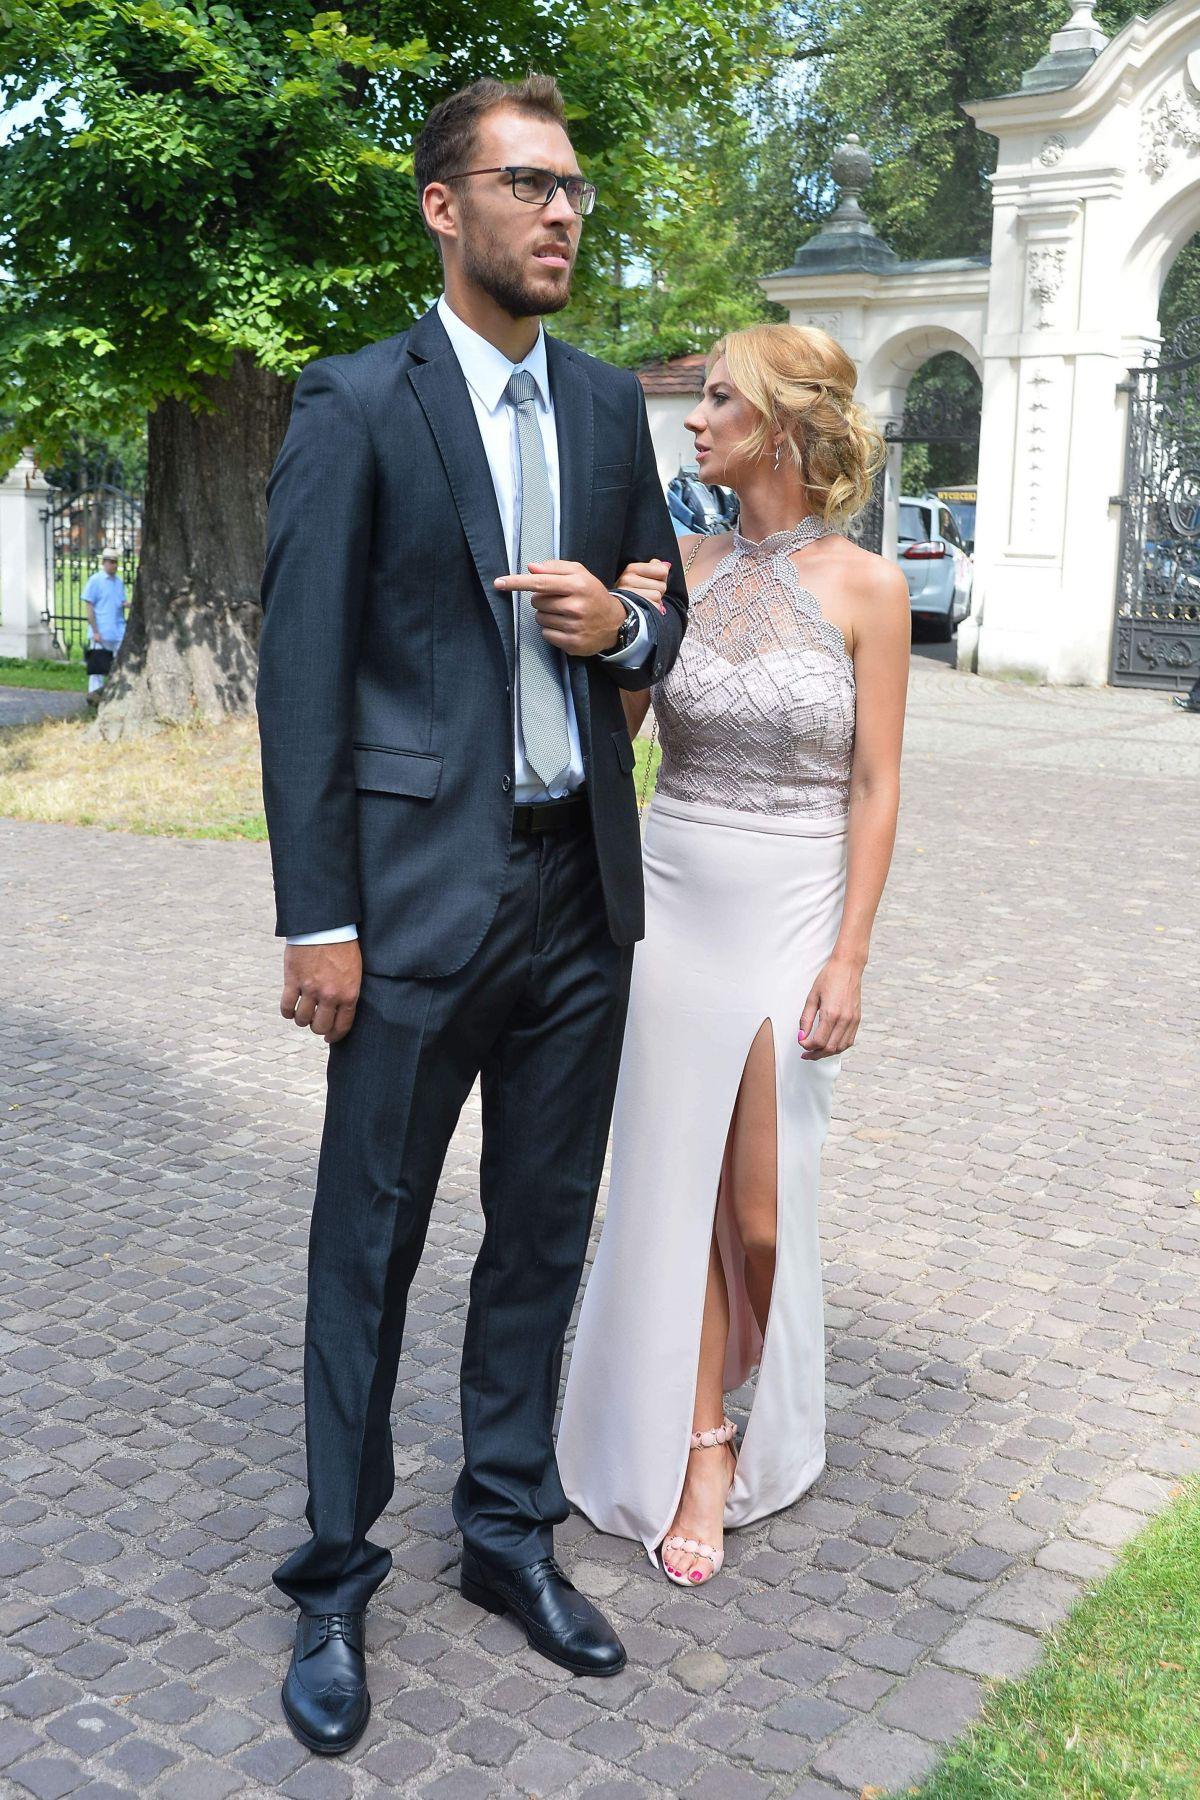 Marta Domachowska At the Wedding of Agnieszka Radwanska in